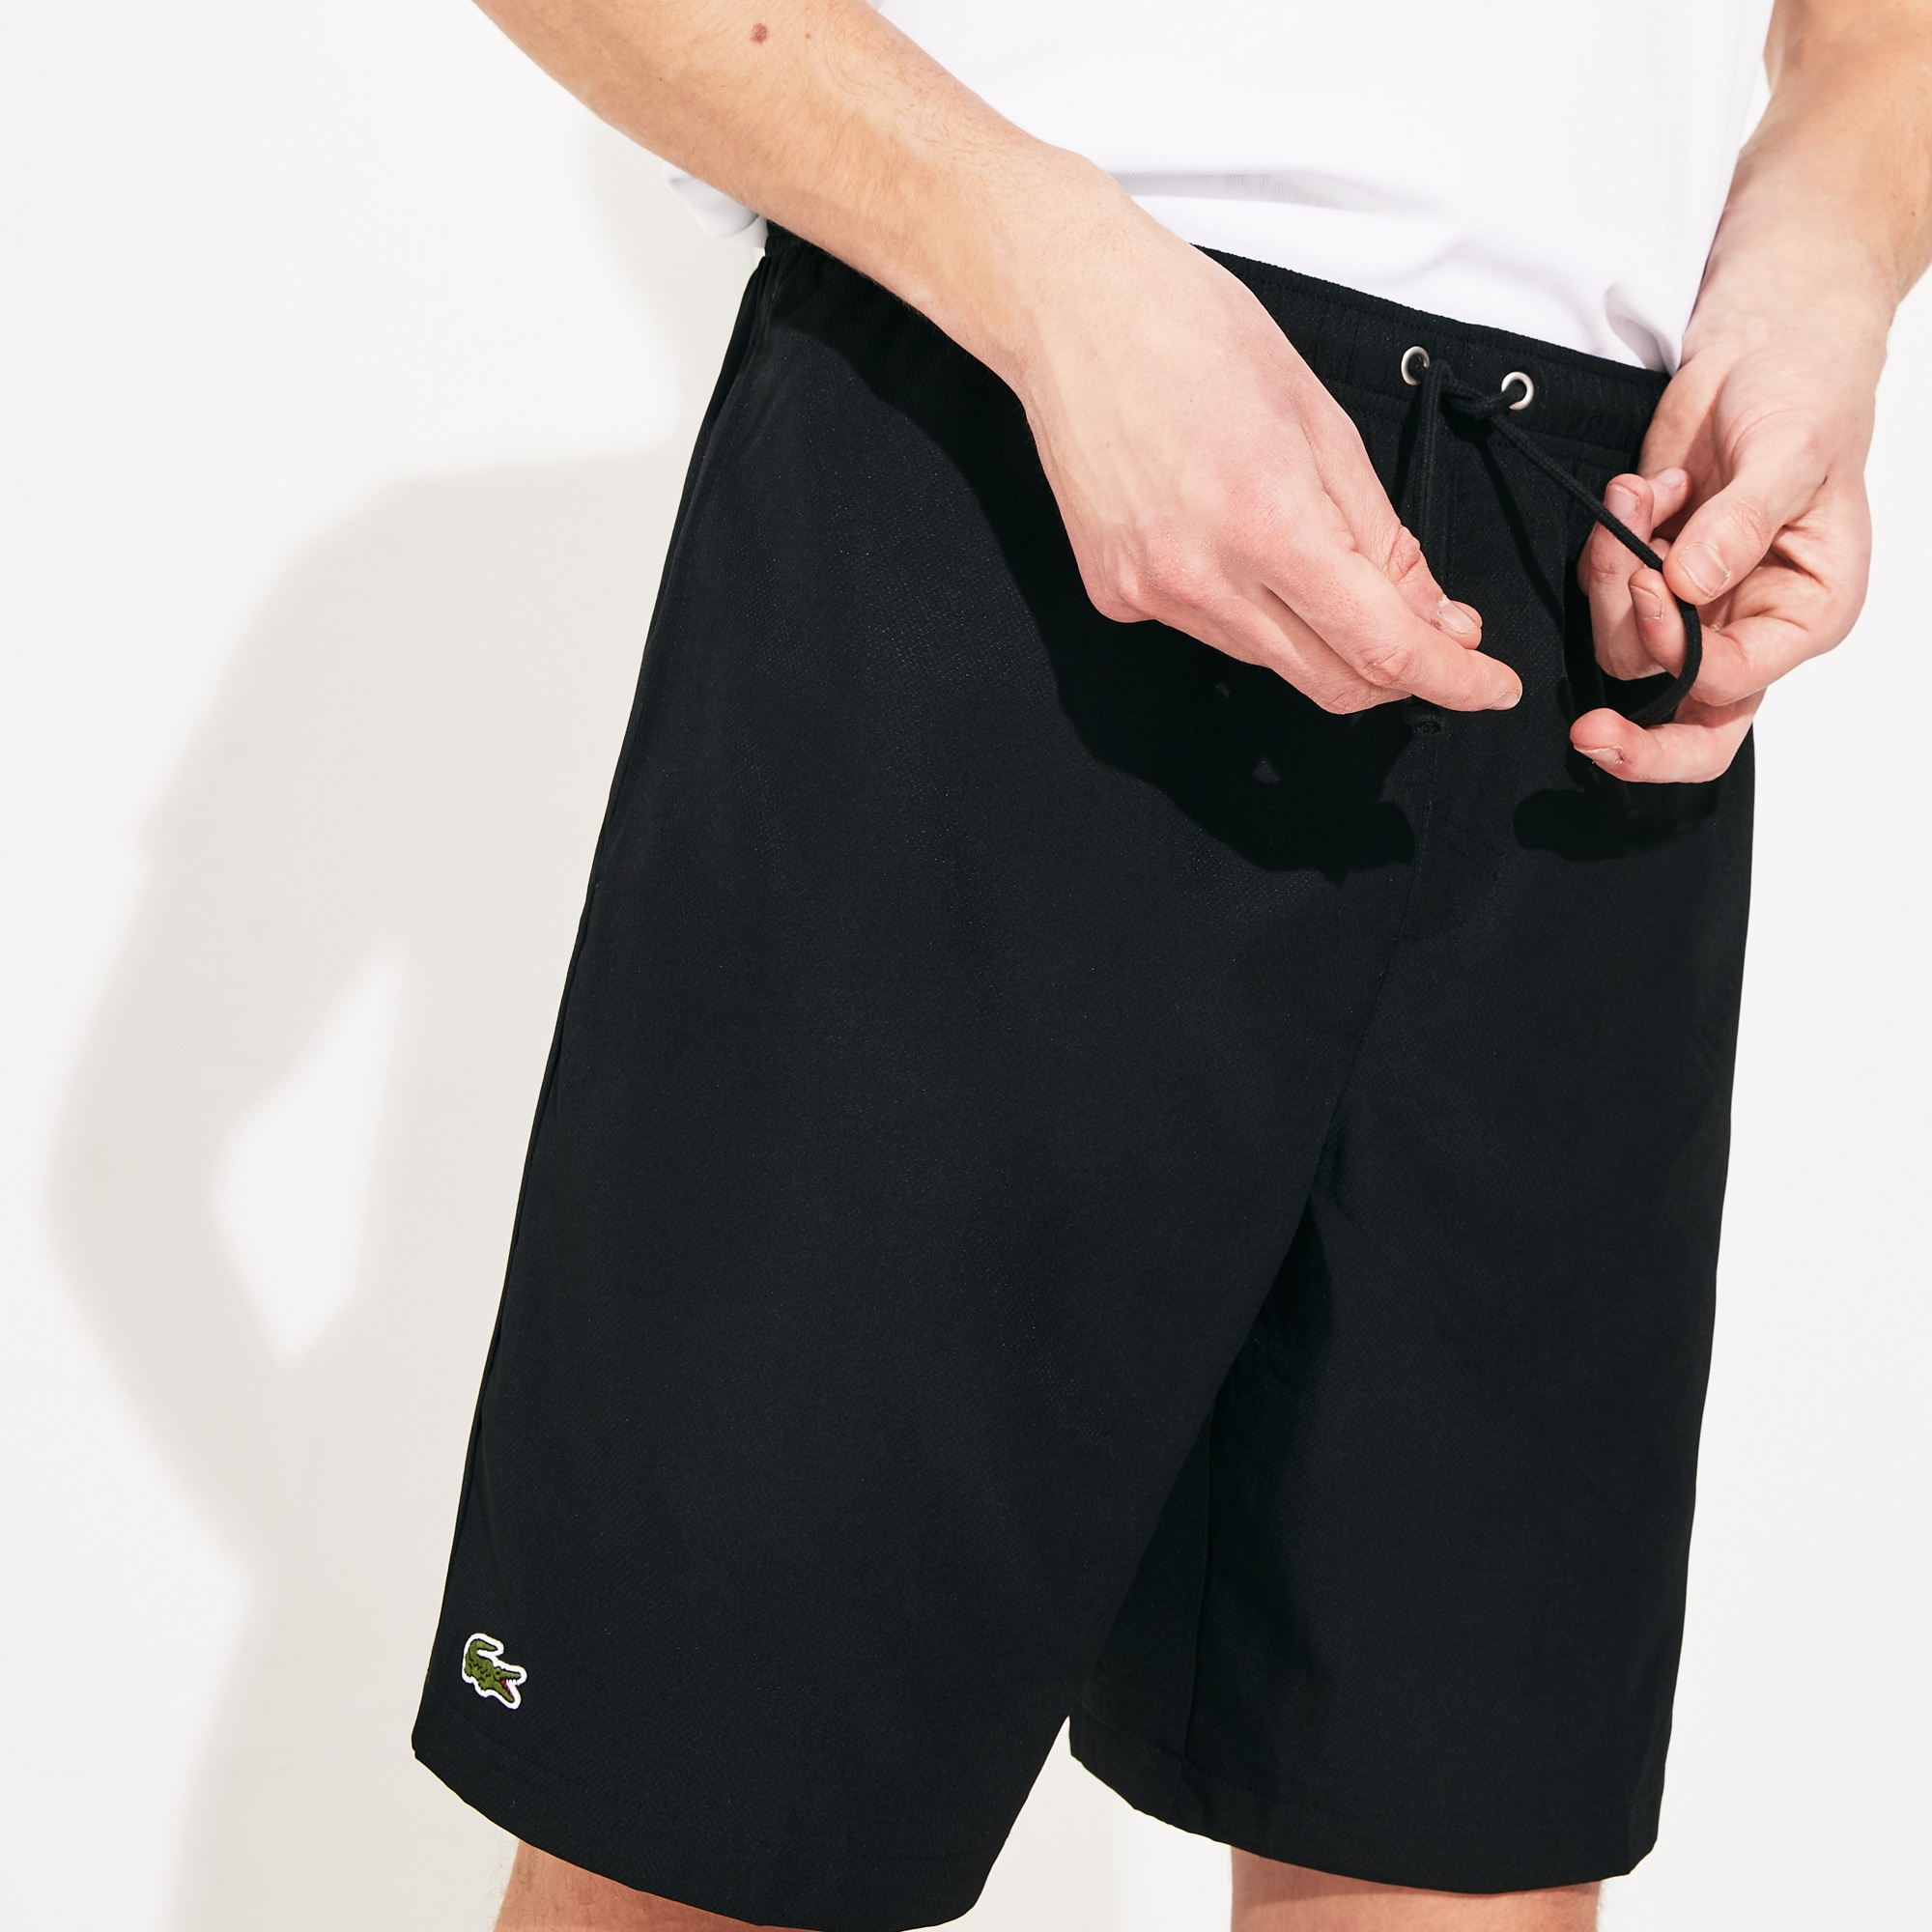 901c01b93 Men s SPORT Tennis Shorts